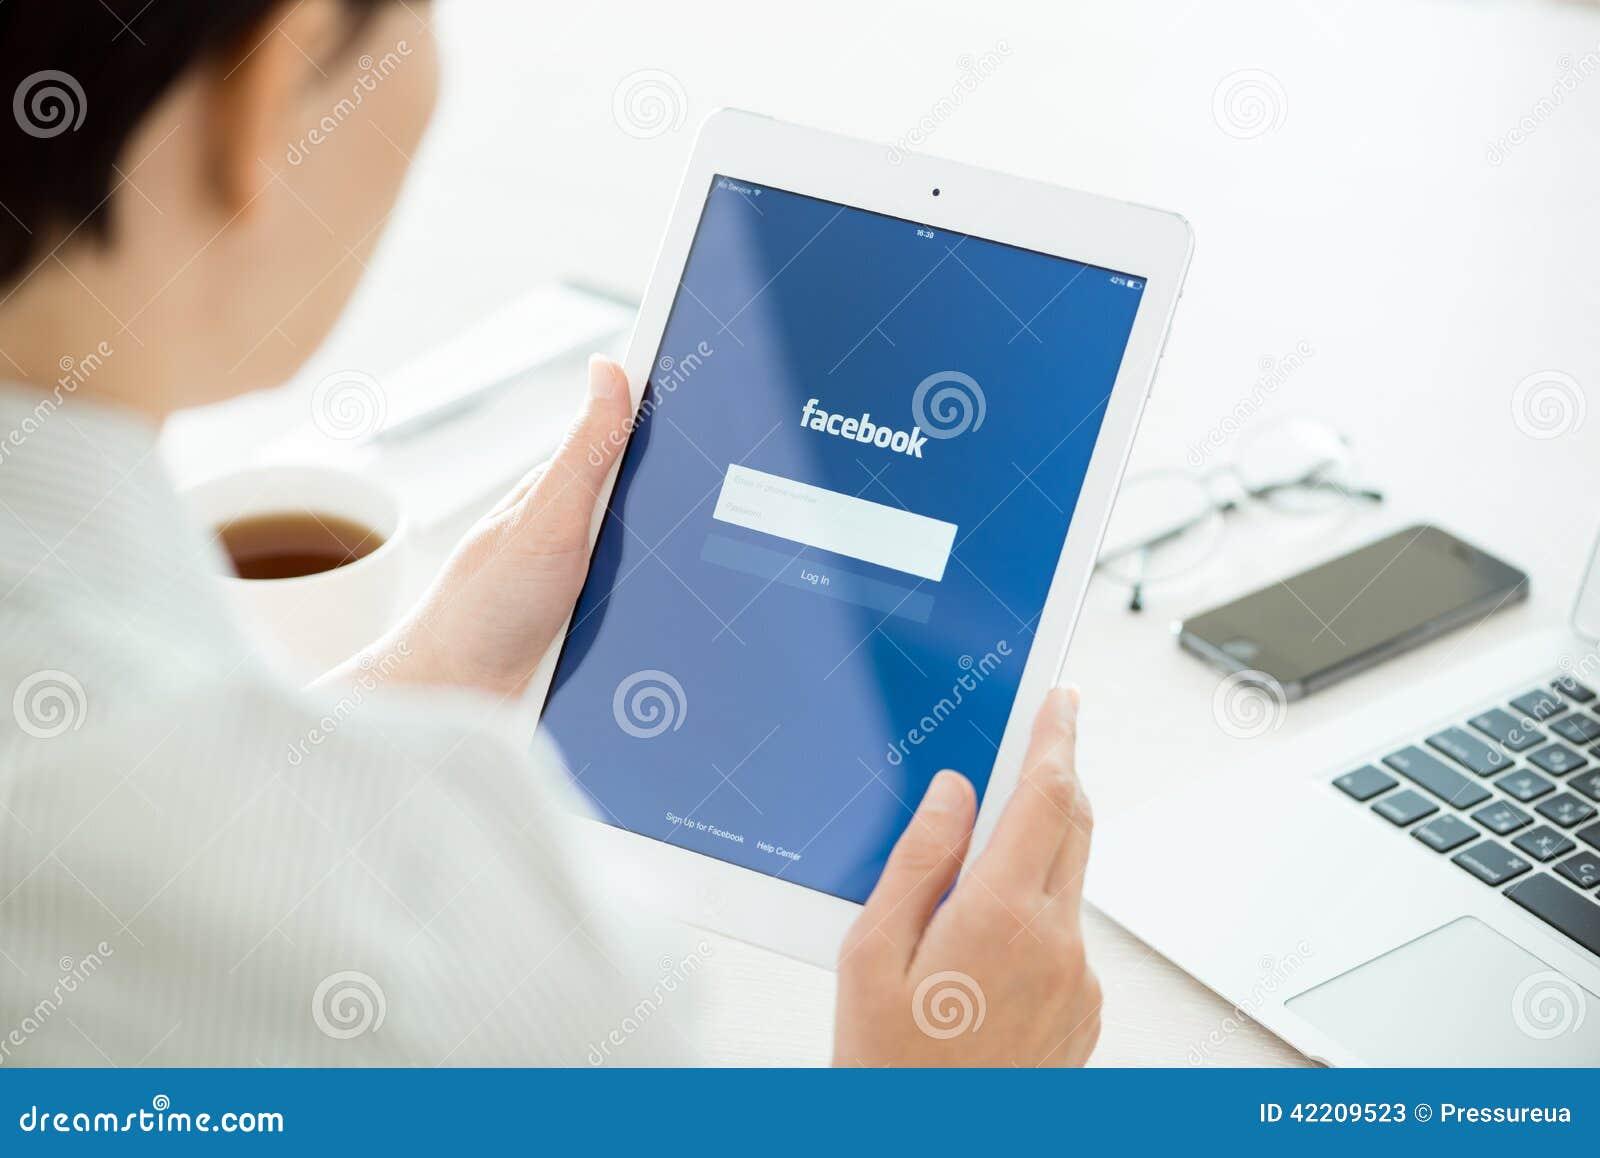 Facebook Ukraine Woman Your 119